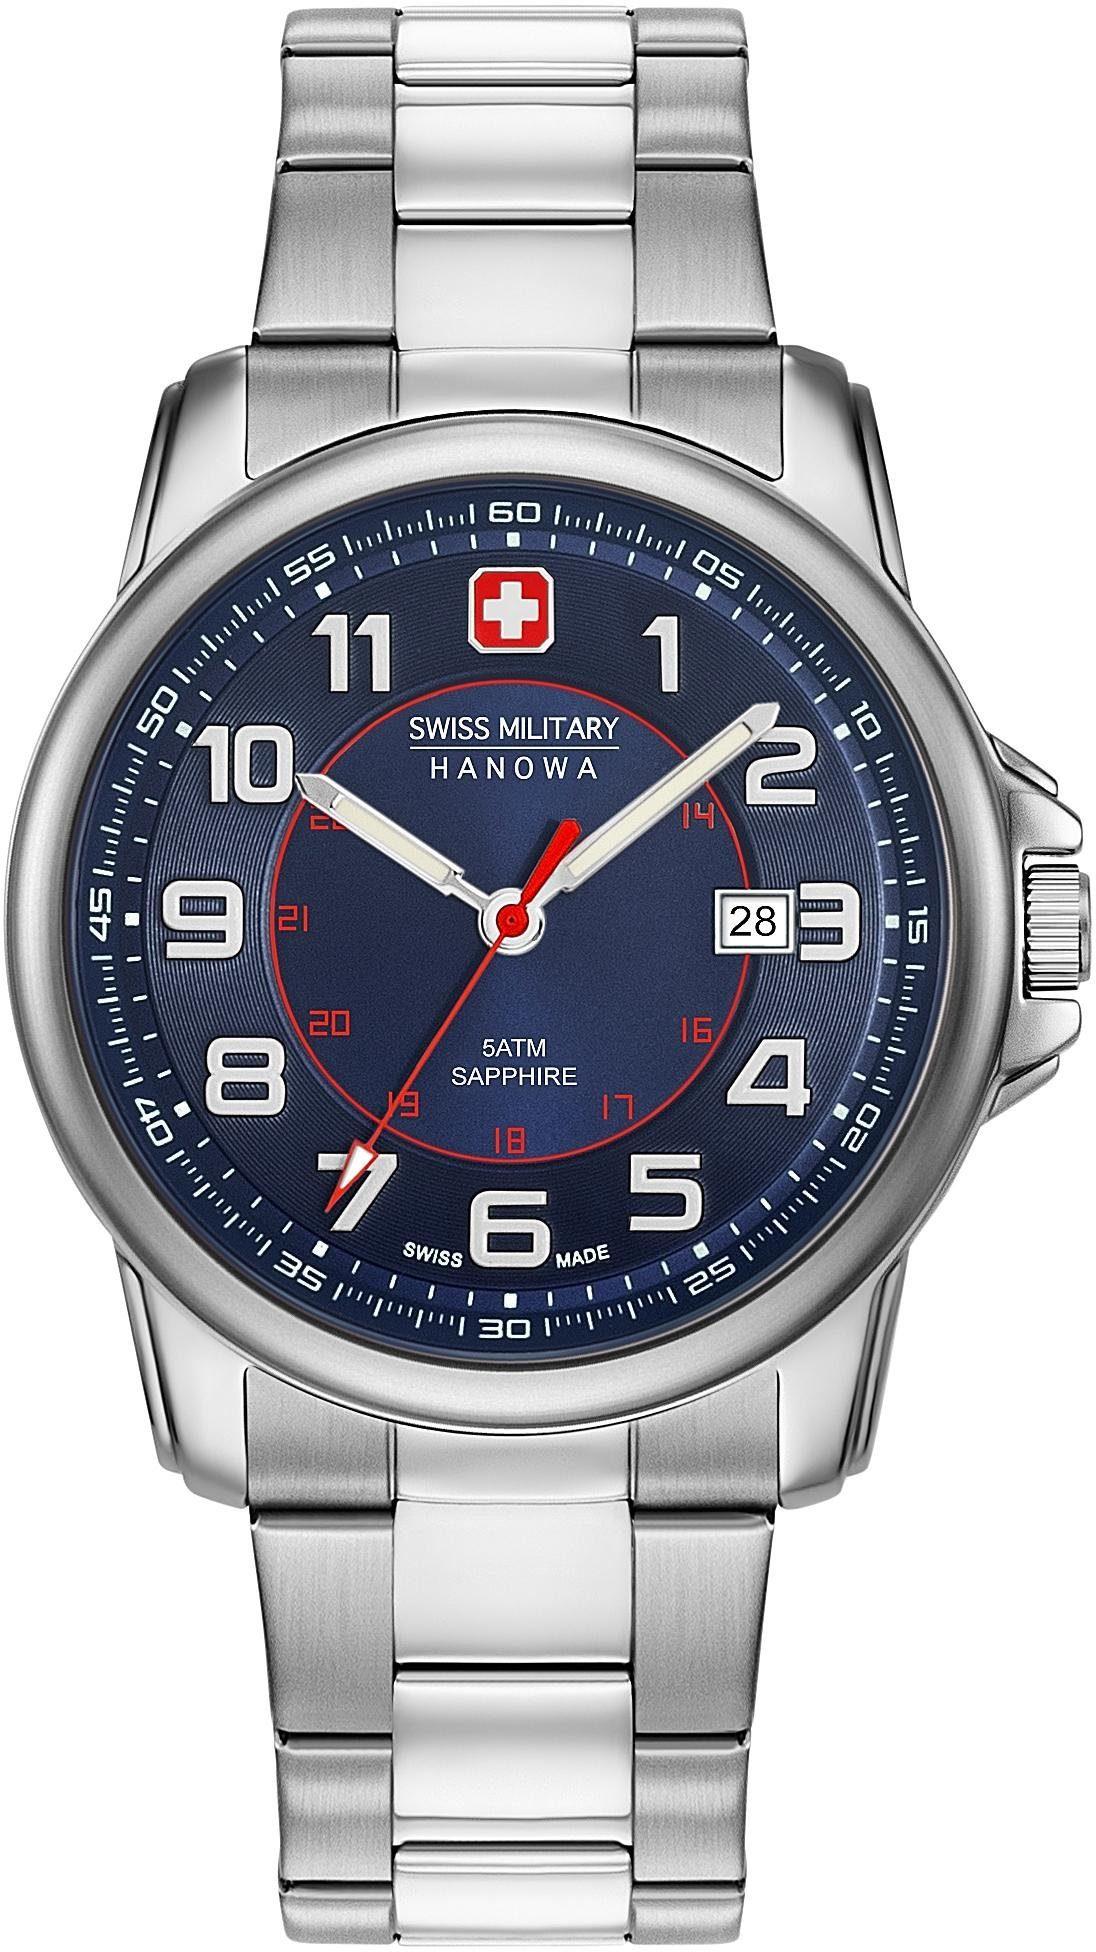 Swiss Military Hanowa Schweizer Uhr SWISS GRENADIER 06-533004003 | Uhren > Schweizer Uhren | Swiss Military Hanowa